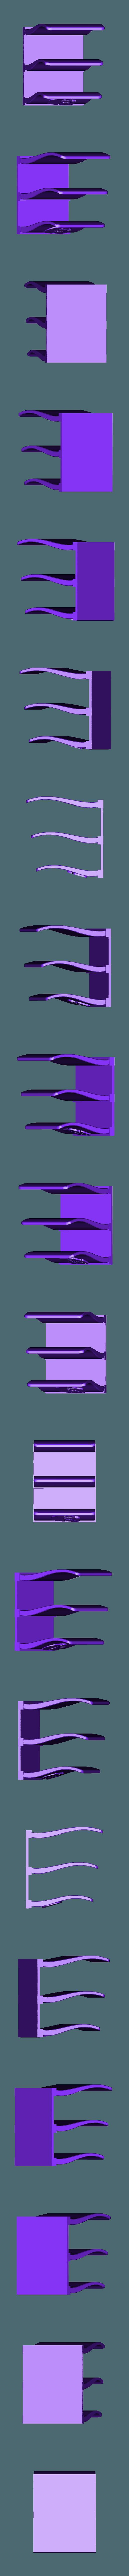 Porte_lettres.stl Download free STL file Porte lettres • 3D print design, Jak13